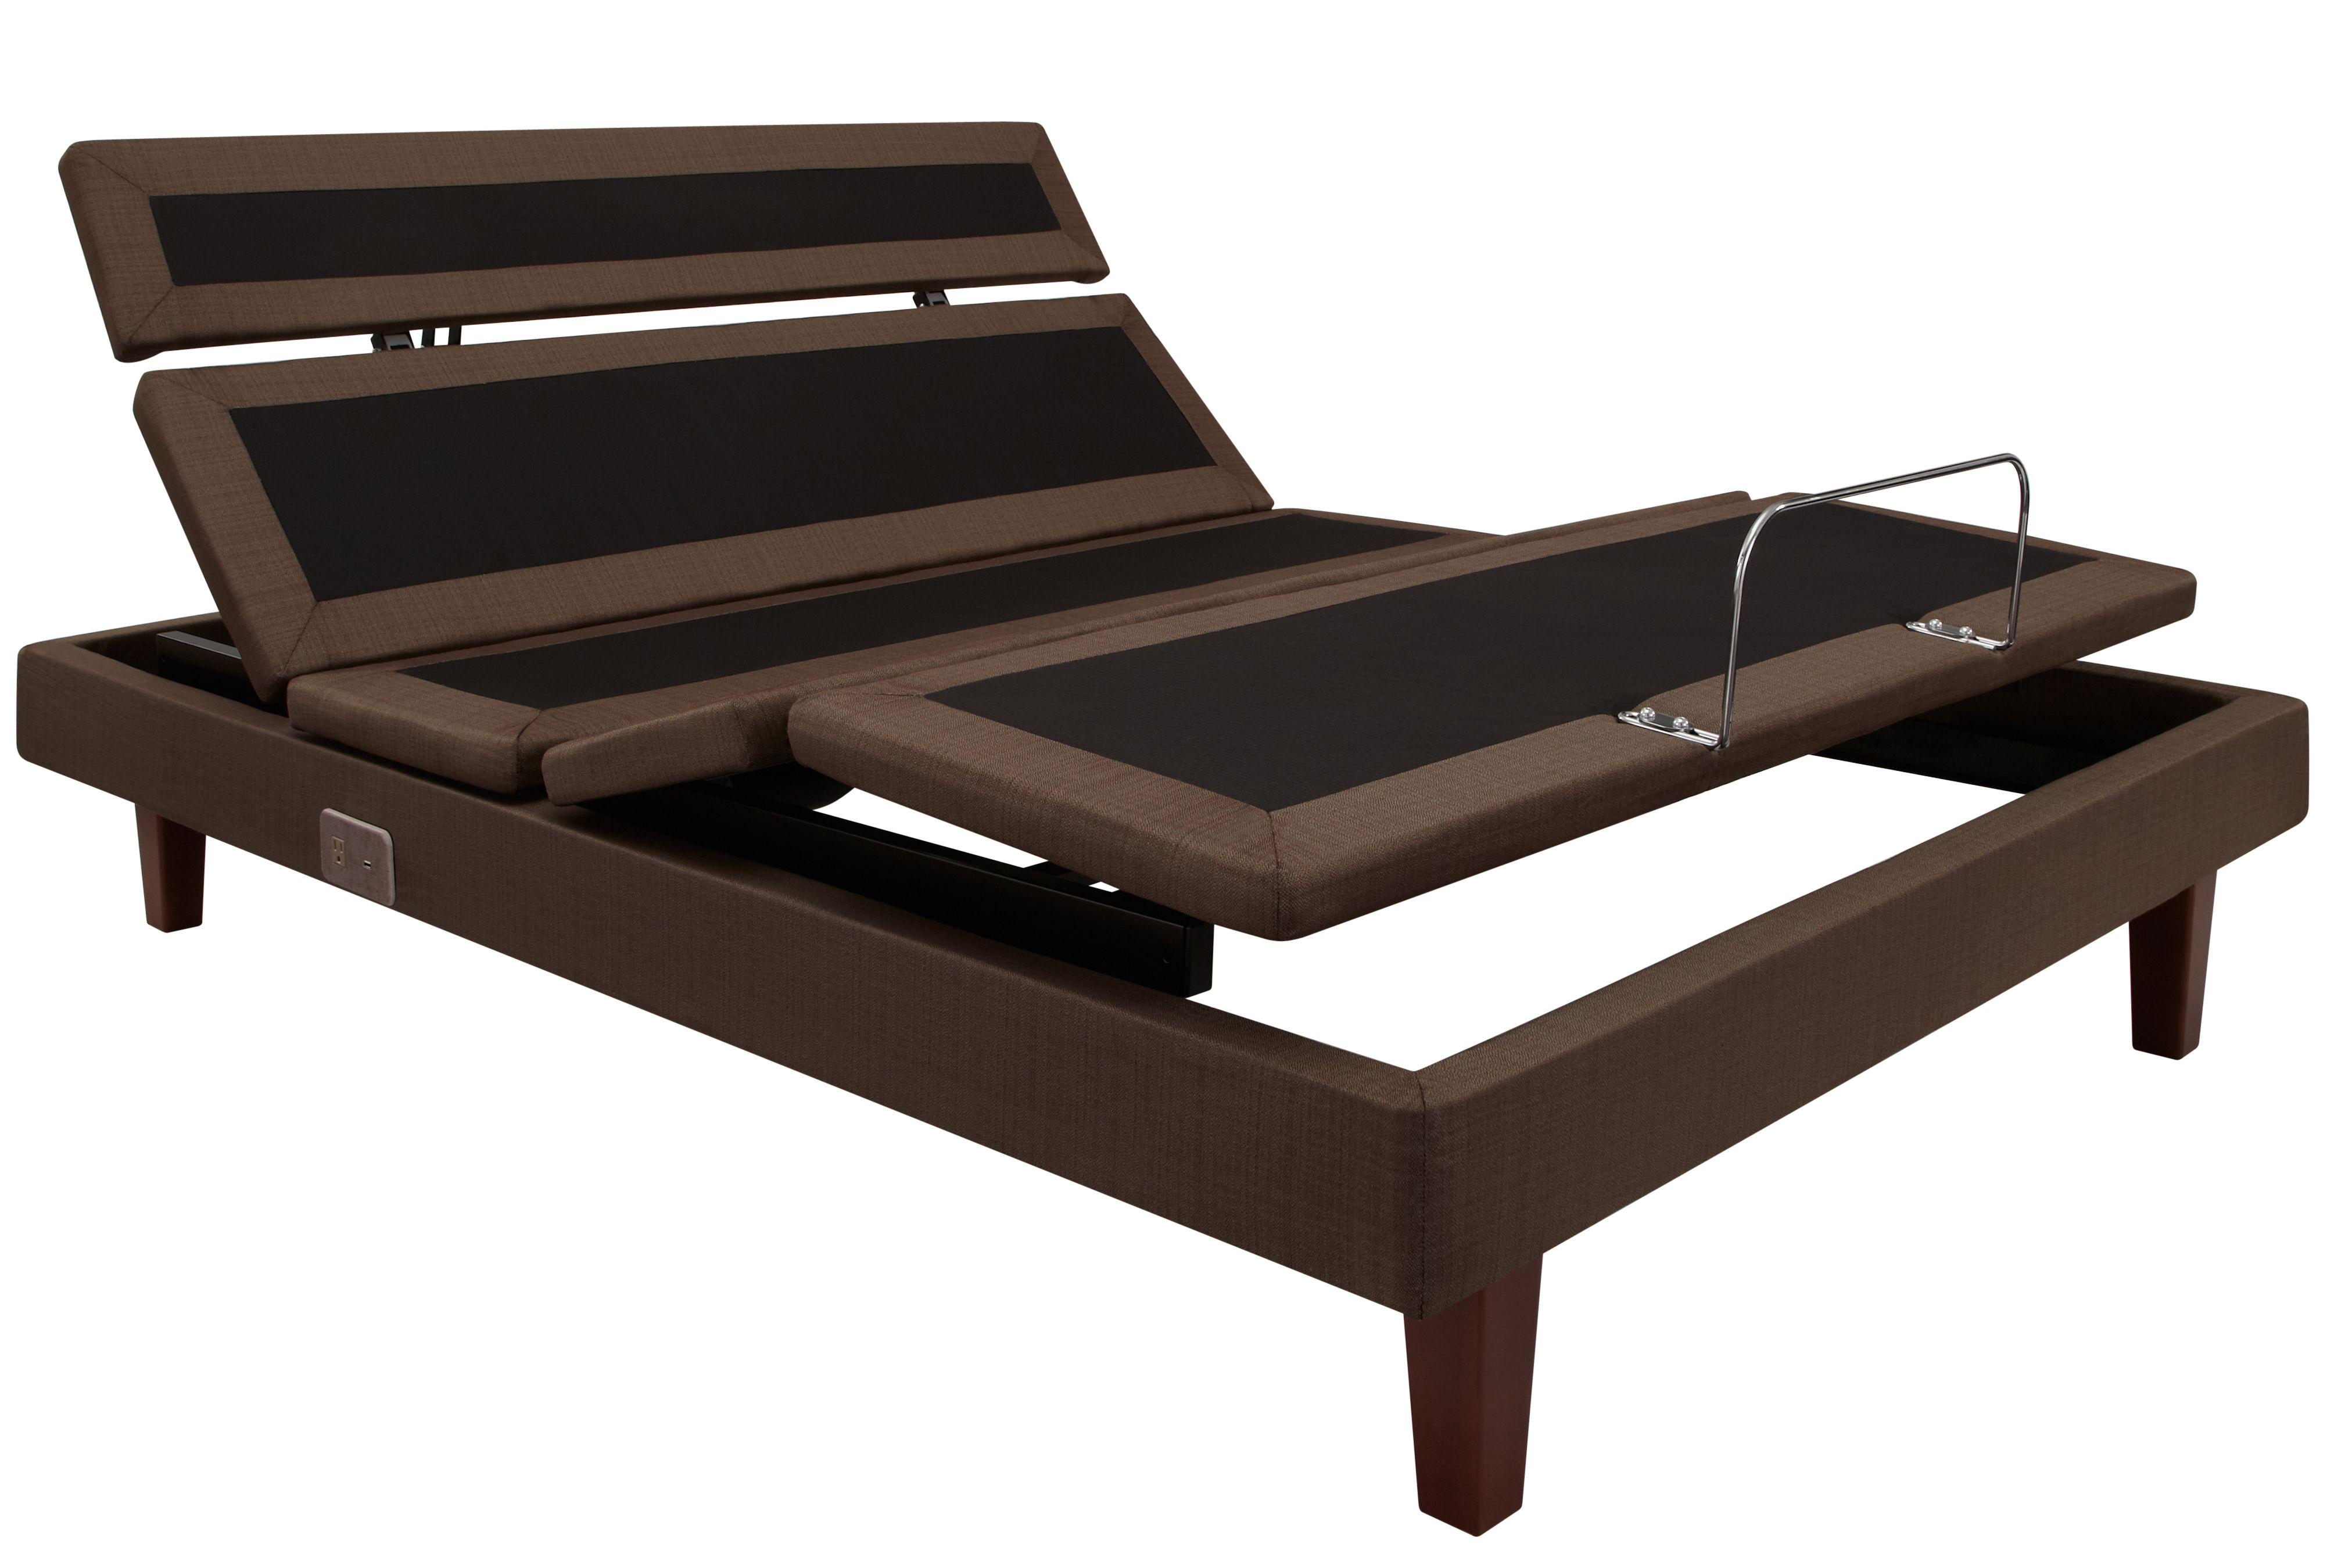 S F California King Reflexion Adjustable Base Set Beds Bed